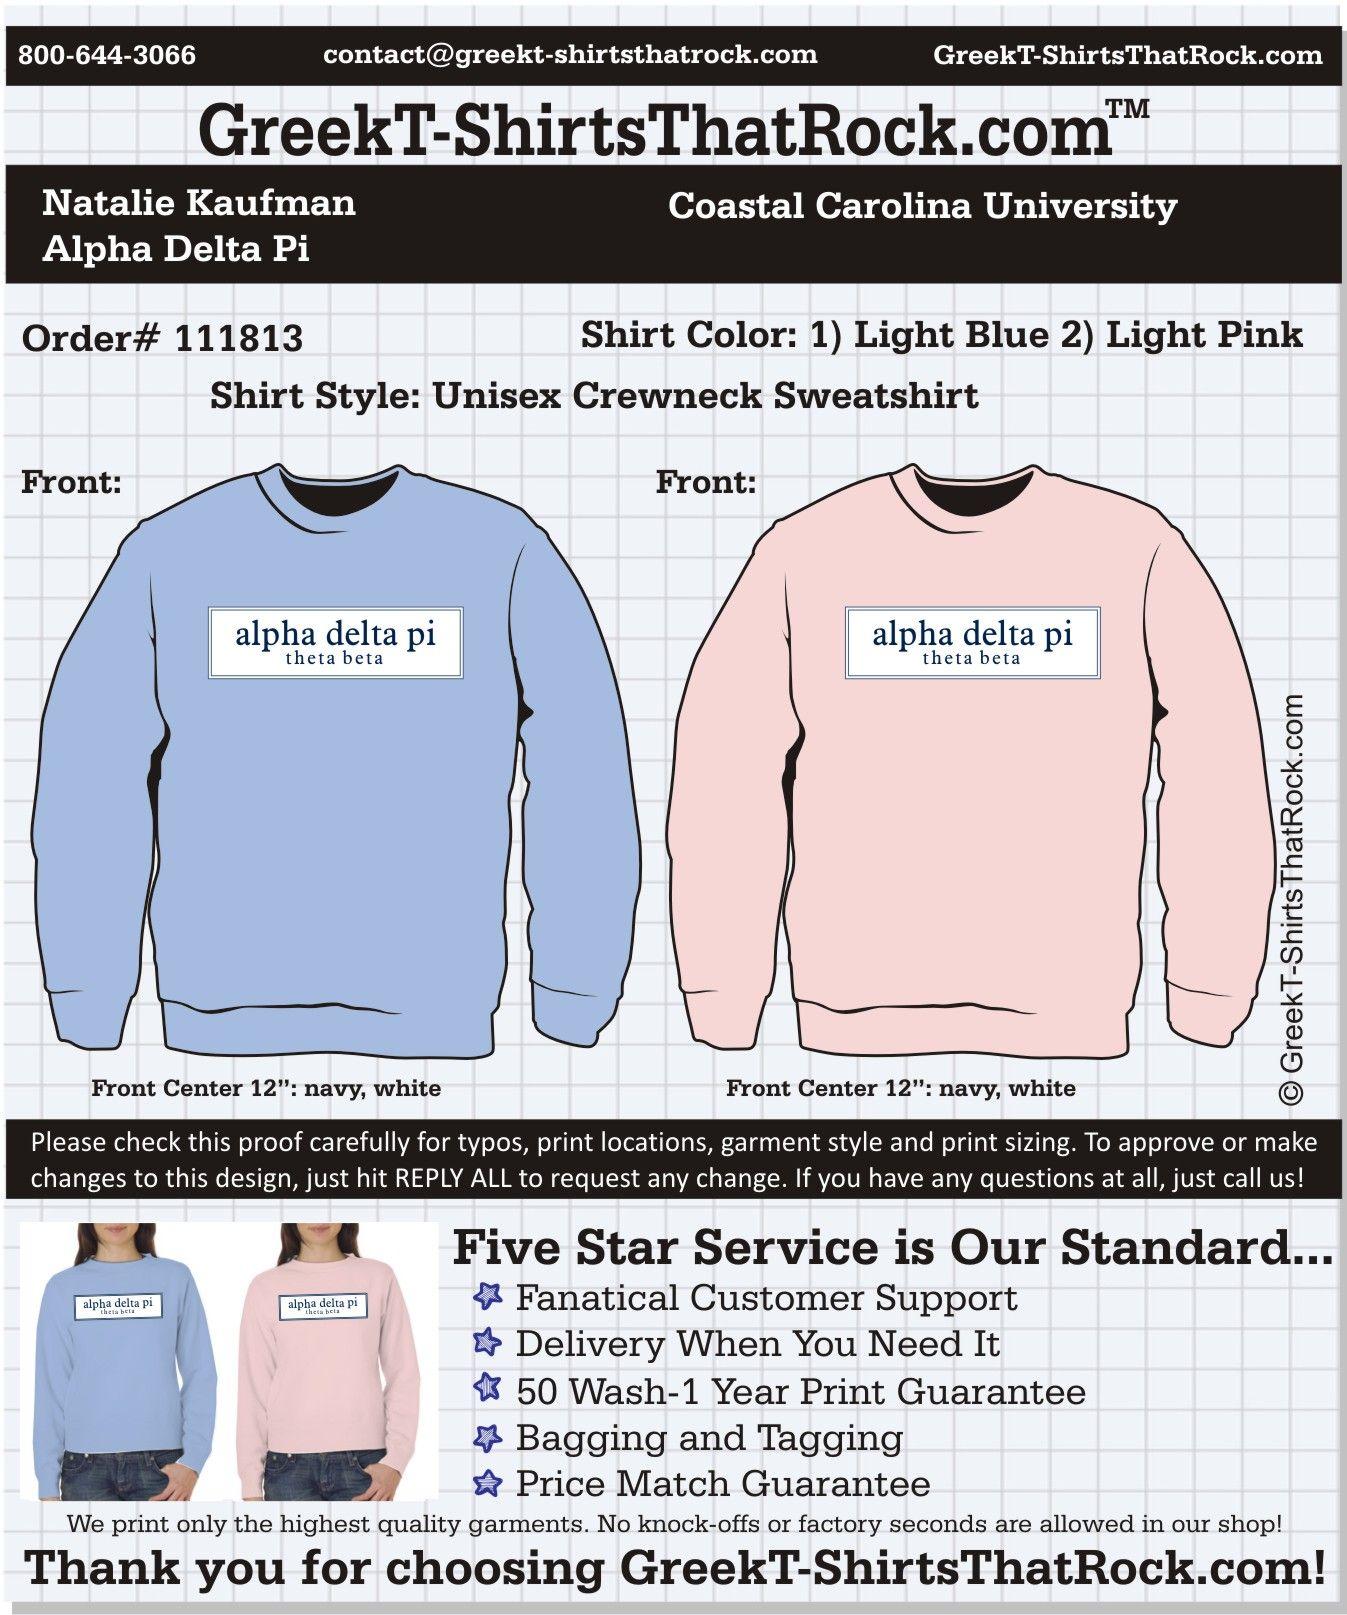 Alpha Delta Pi Sweatshirt Http Www Greekt Shirtsthatrock Com We Need This Ish So So Cute Alpha Delta Pi Sweatshirts Alpha Delta Pi T Shirt Time [ 1615 x 1347 Pixel ]